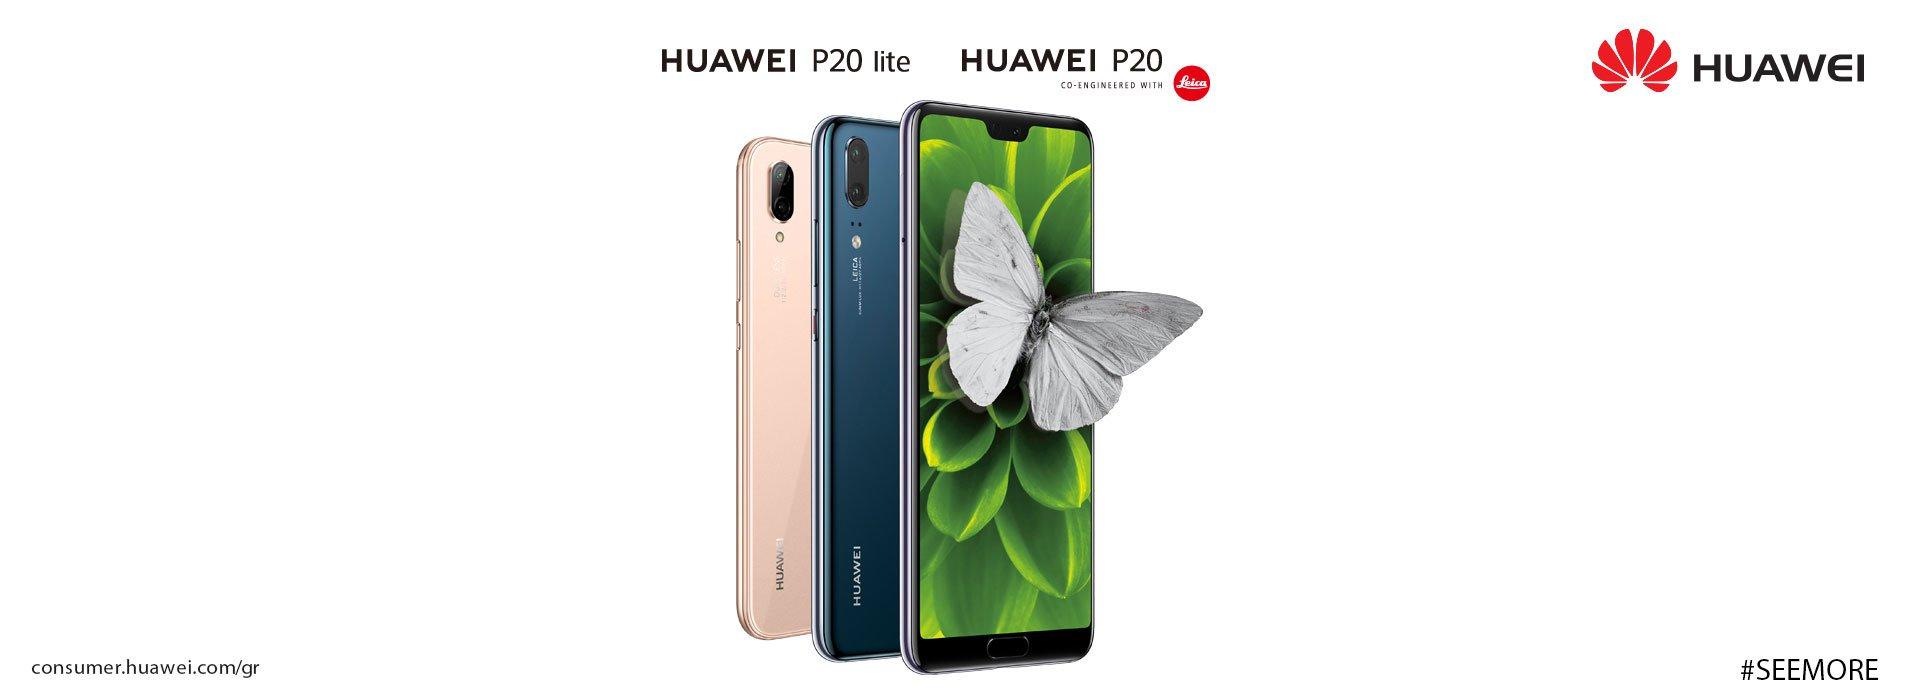 Huawei P20 - P20 lite